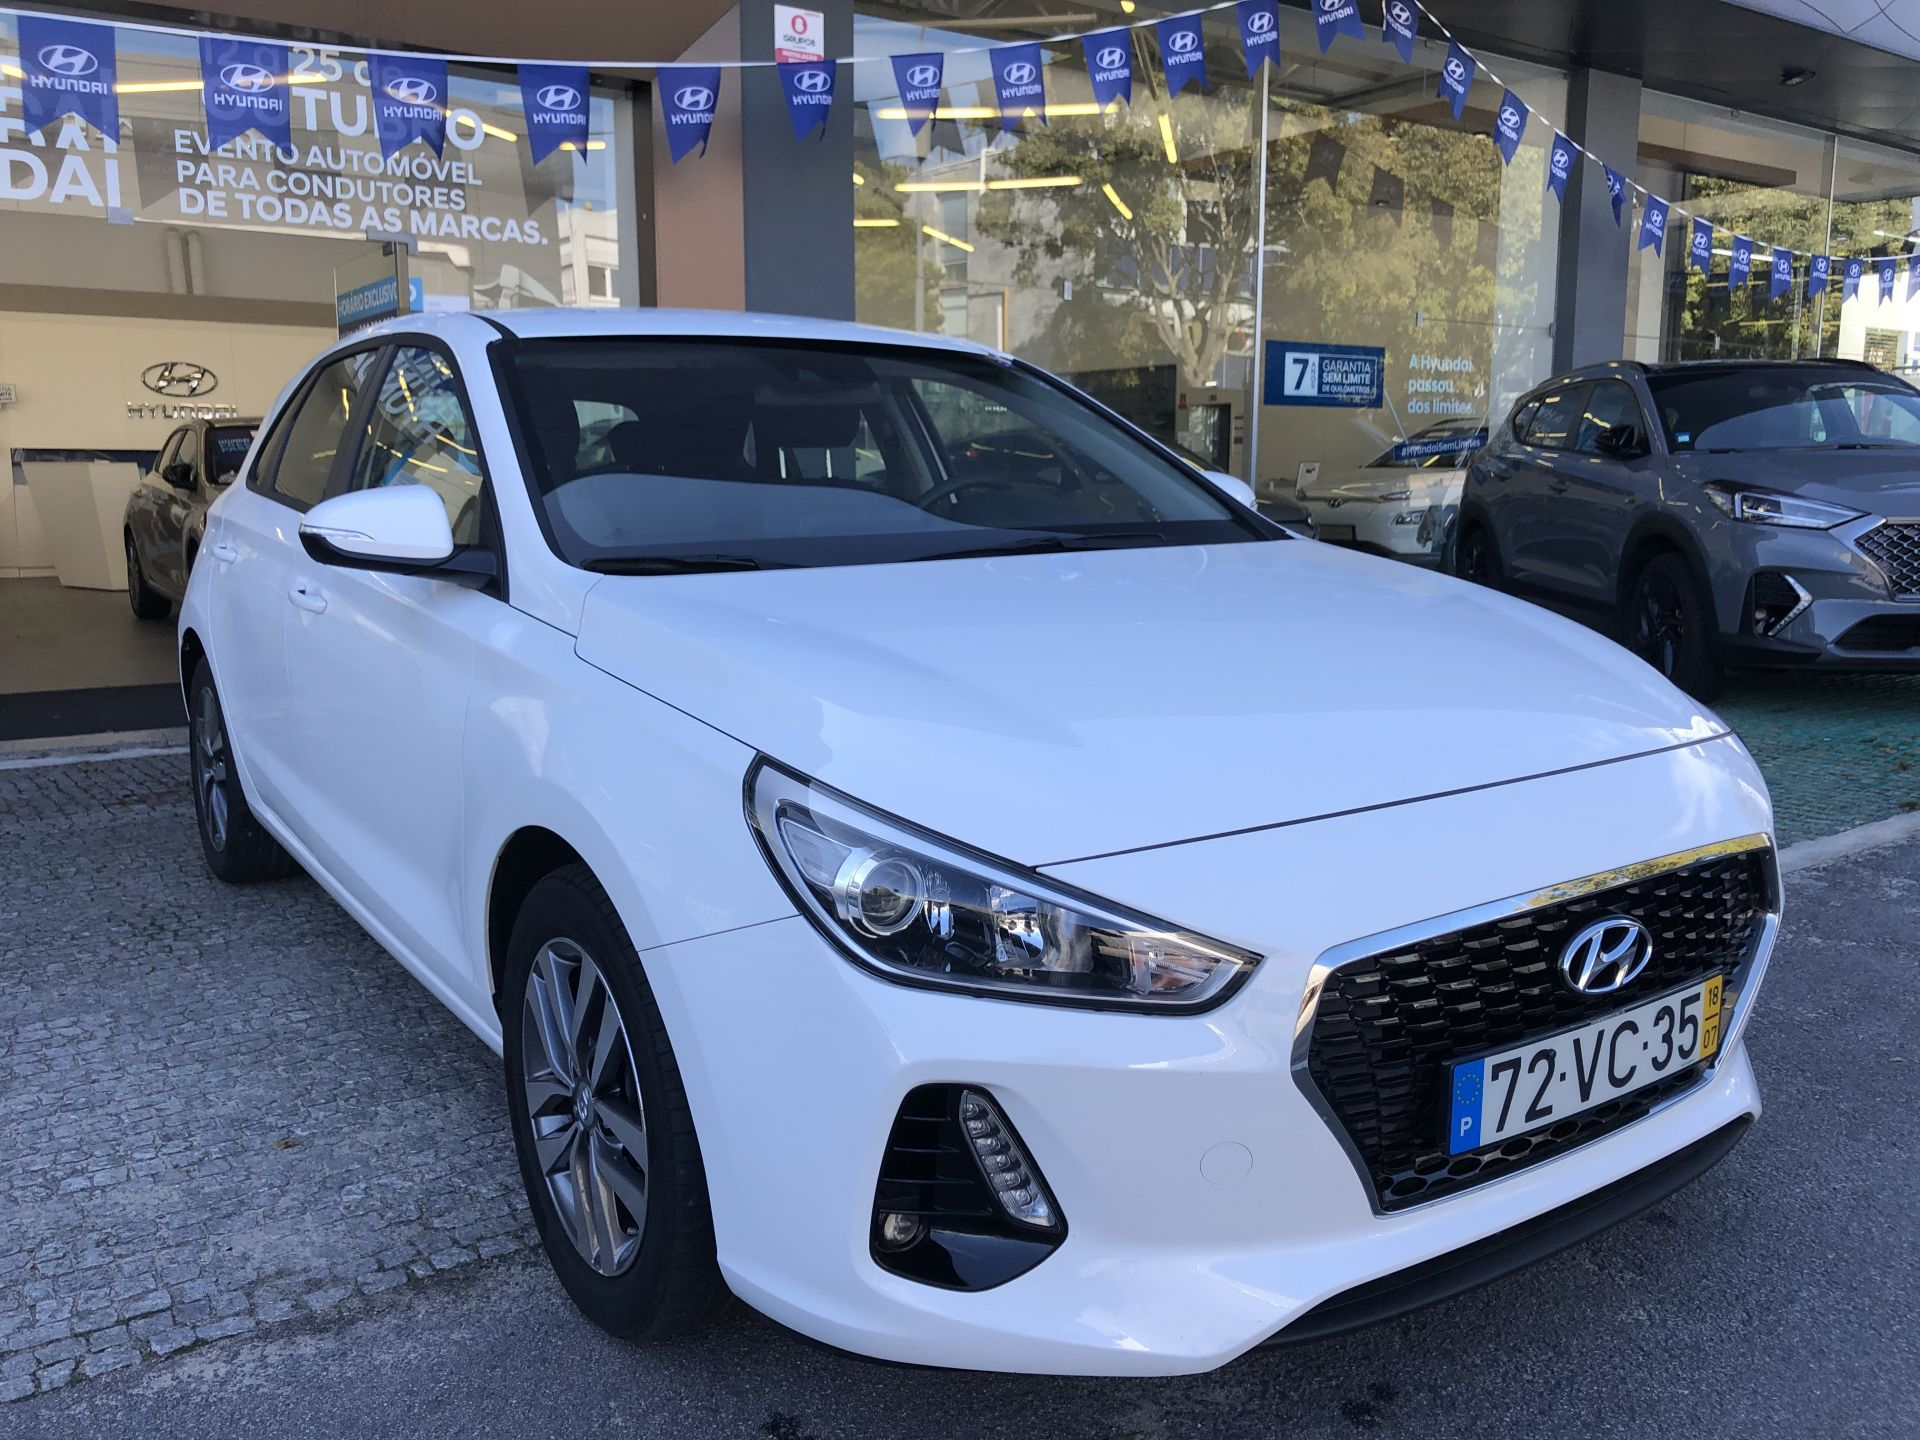 Hyundai i30 5P 1.0 TGDi COMFORT + NAVI 120CV segunda mão Porto